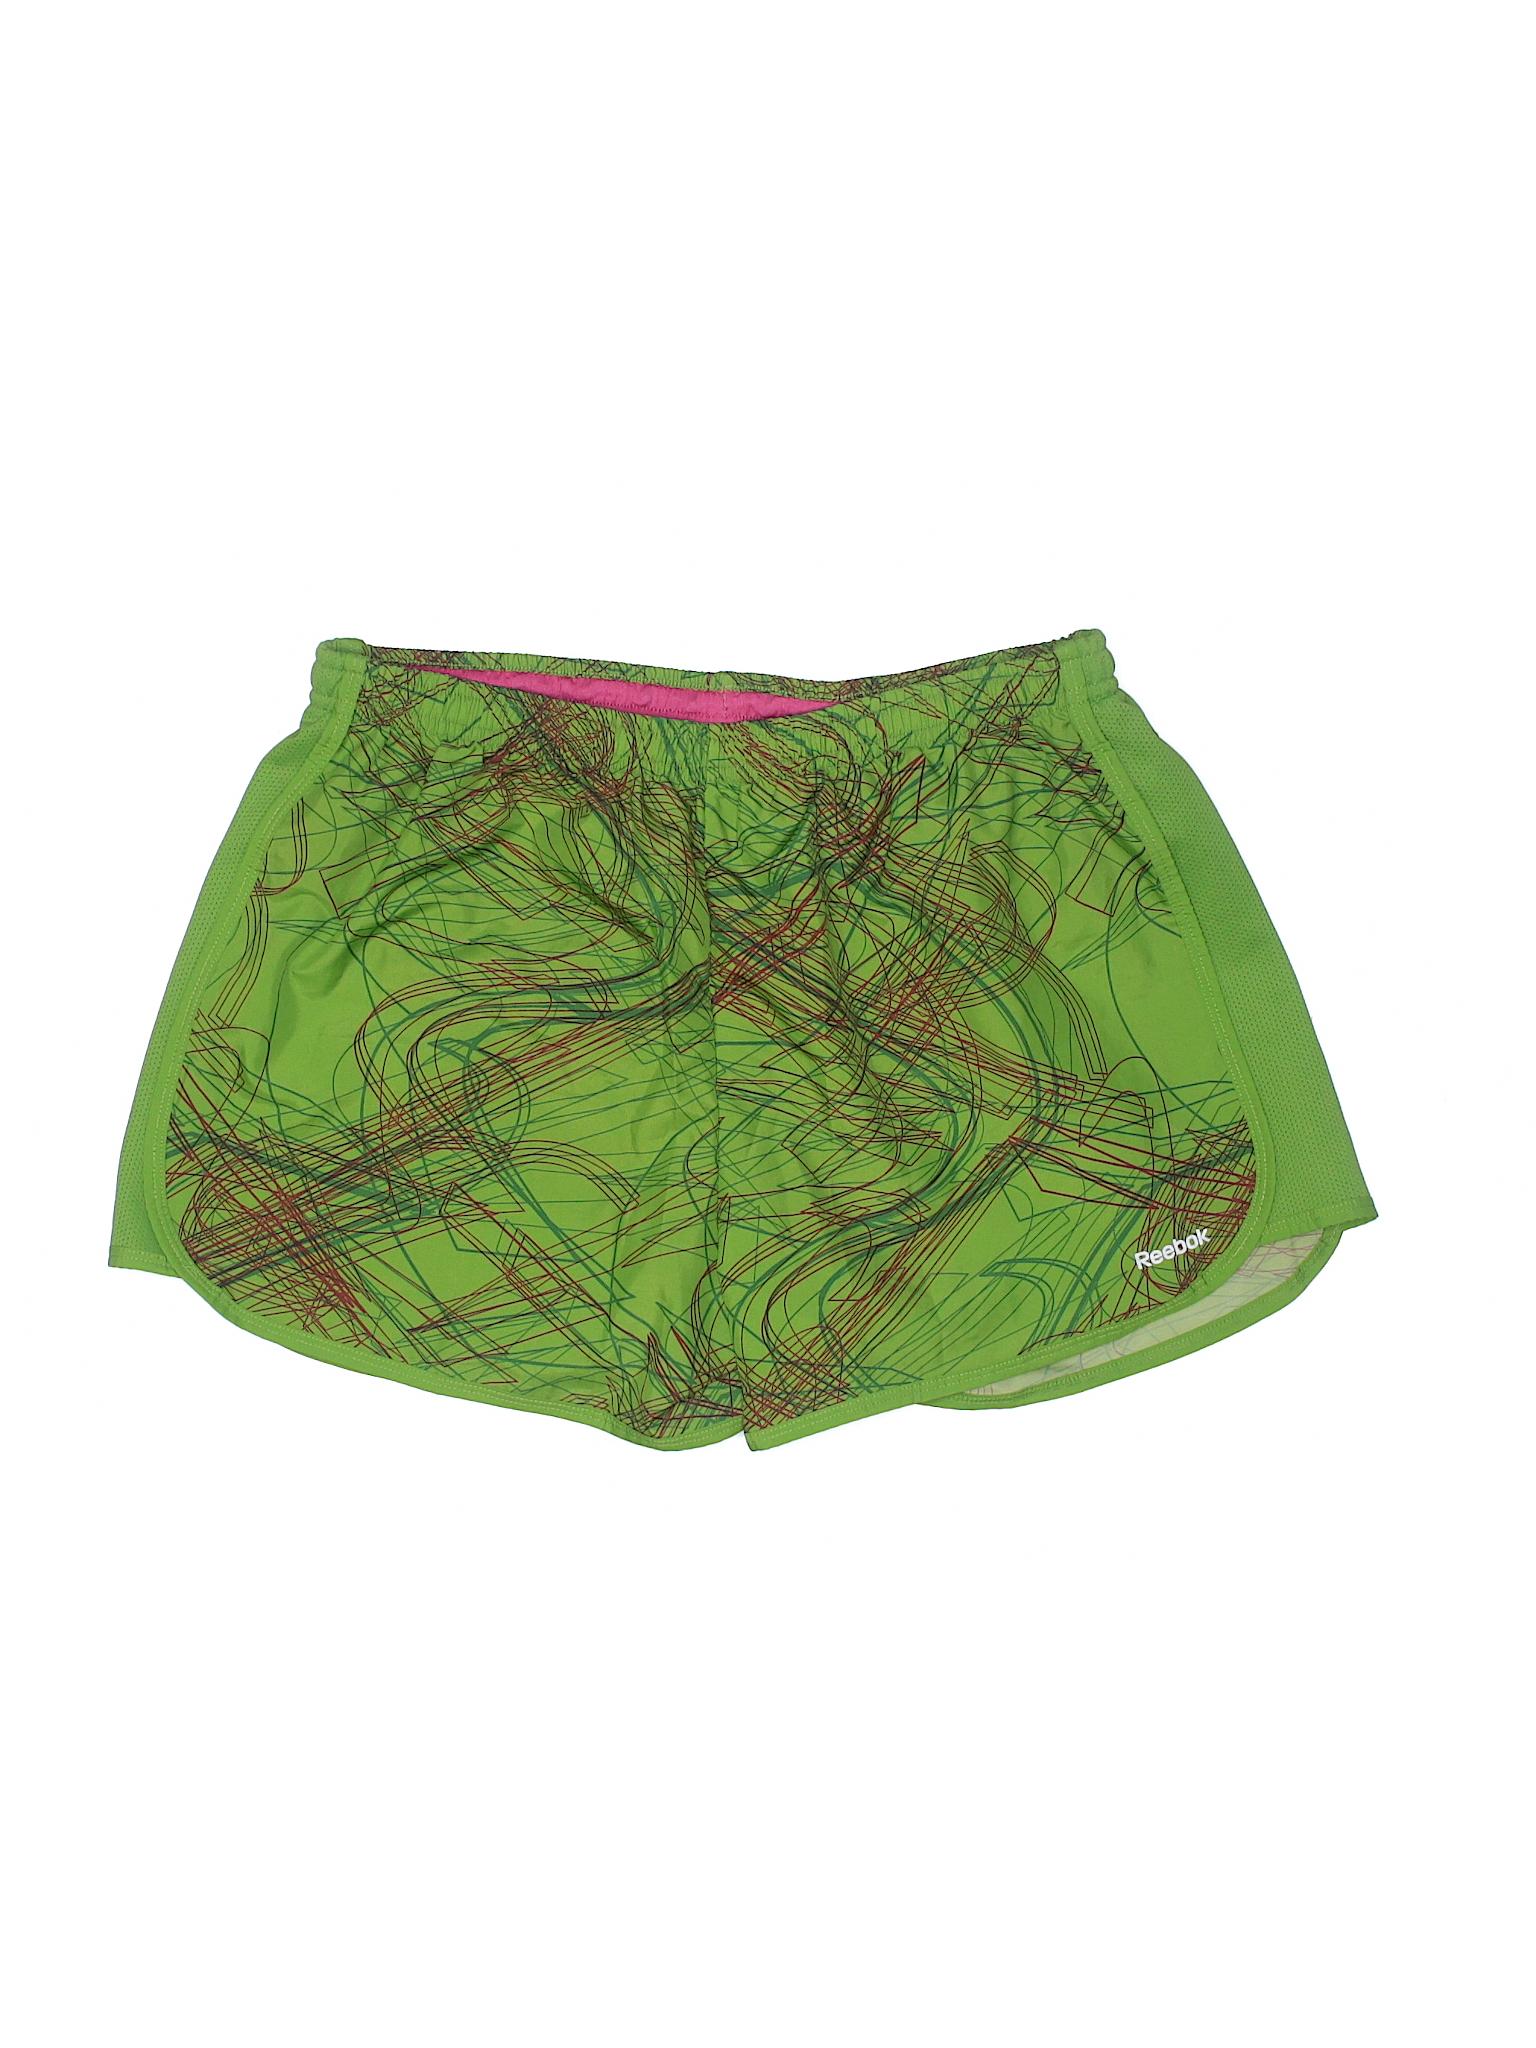 Reebok Boutique Athletic Shorts Boutique Reebok wp7xa4qw